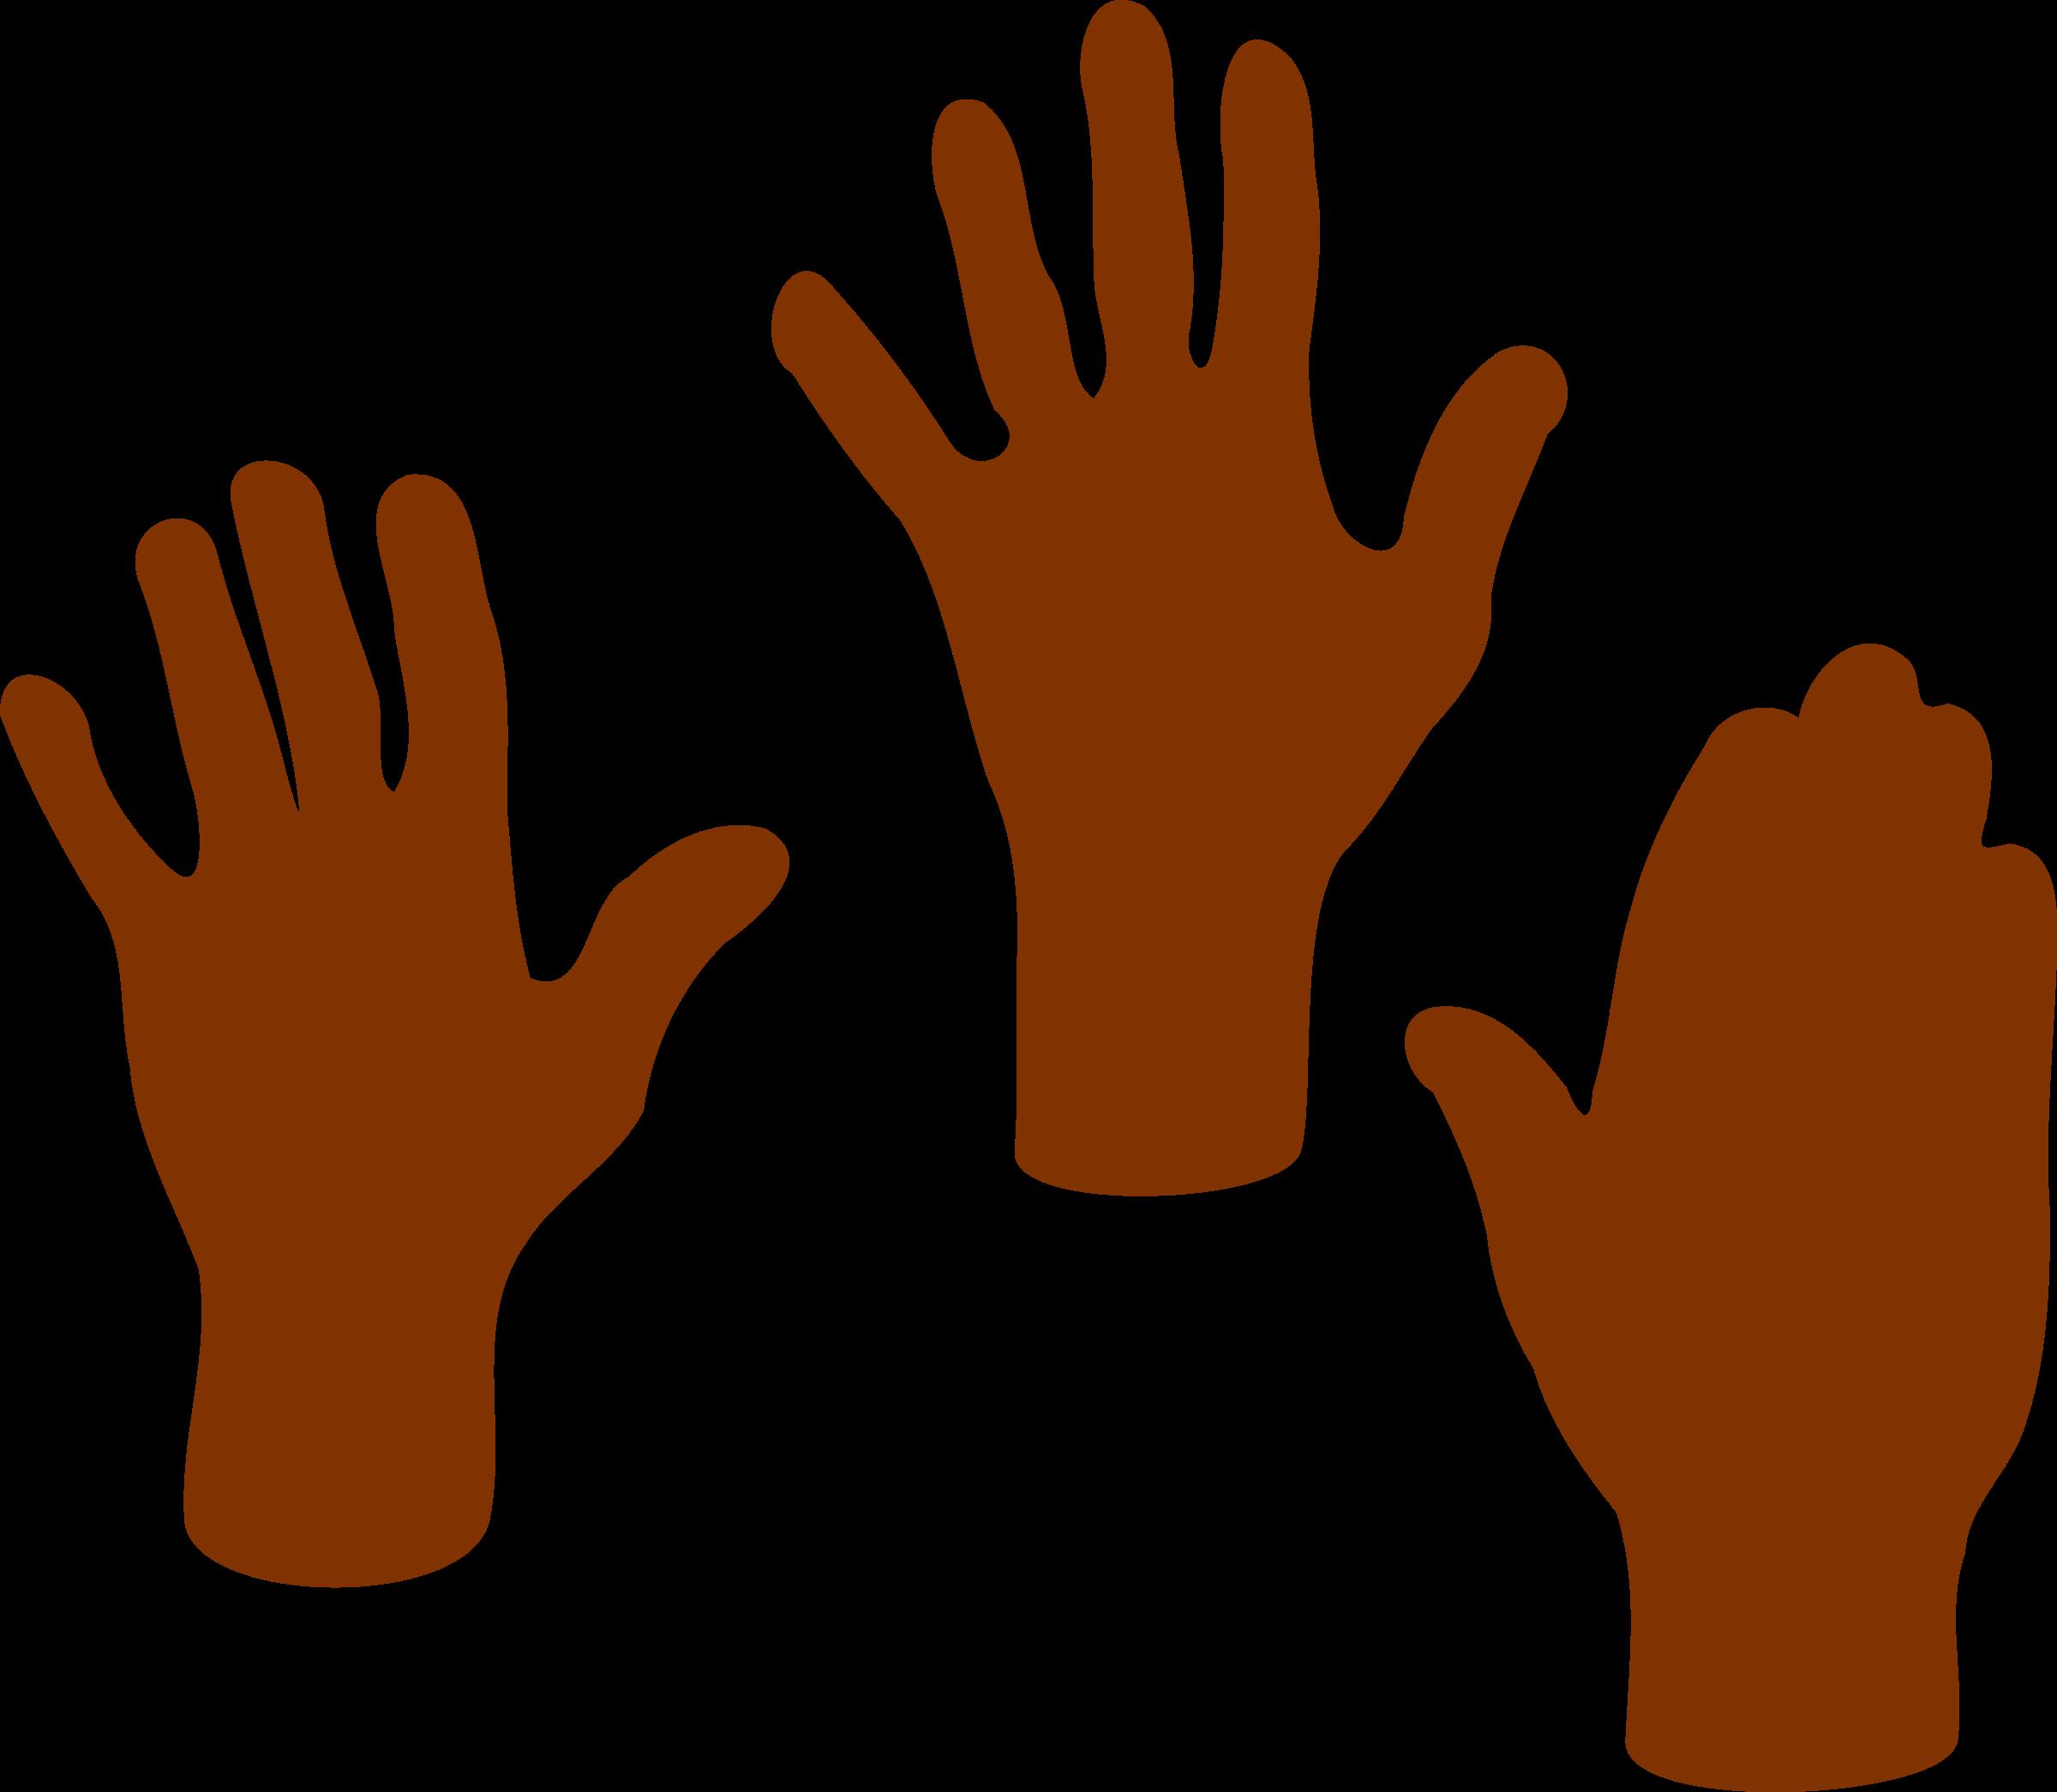 Finger clipart brown hand. Hands big image png